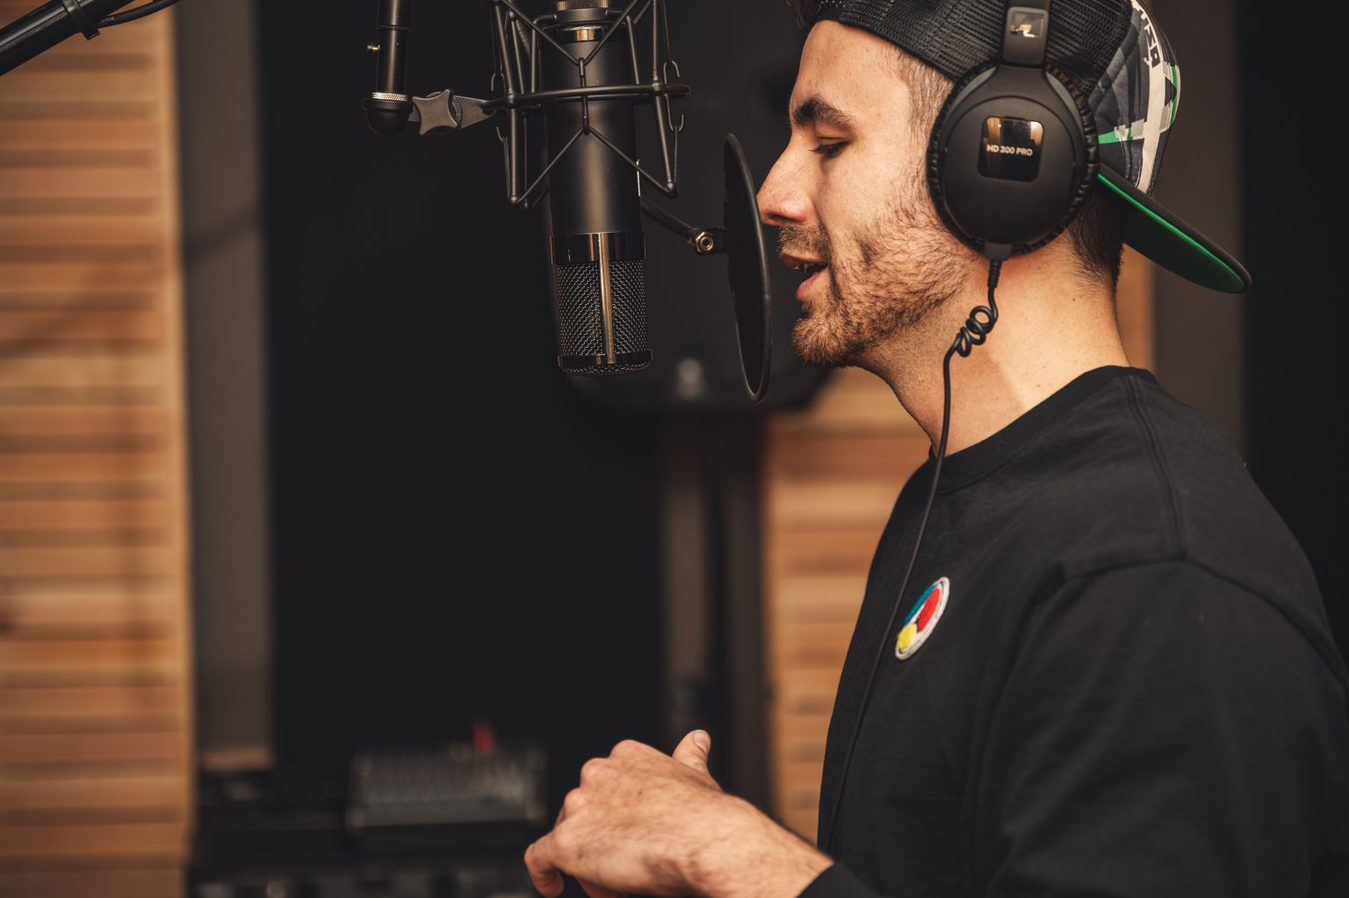 man wearing headphones speaking into studio microphone